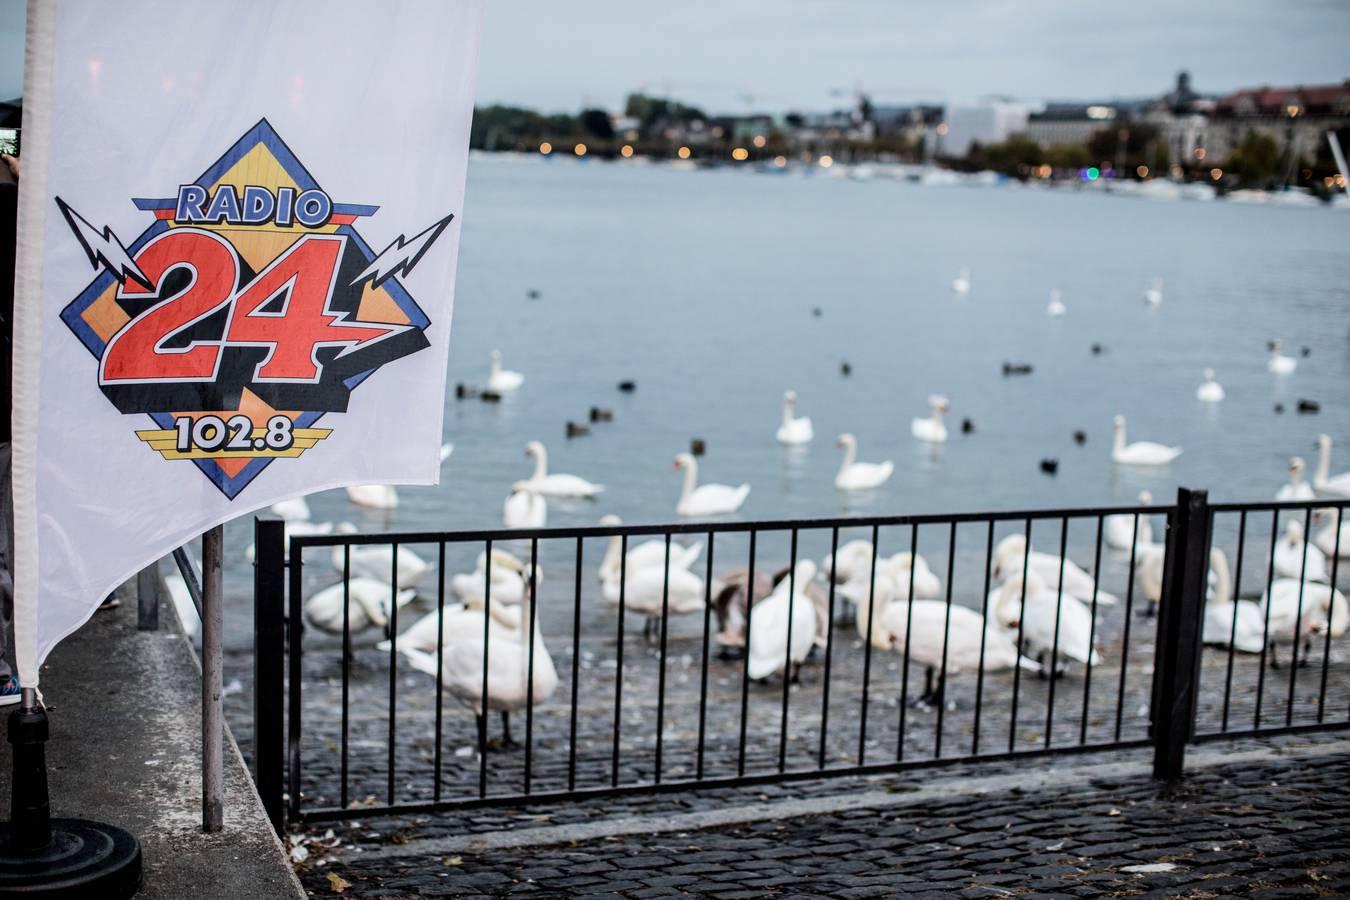 Ehemaligen-Anlass (© Radio 24)